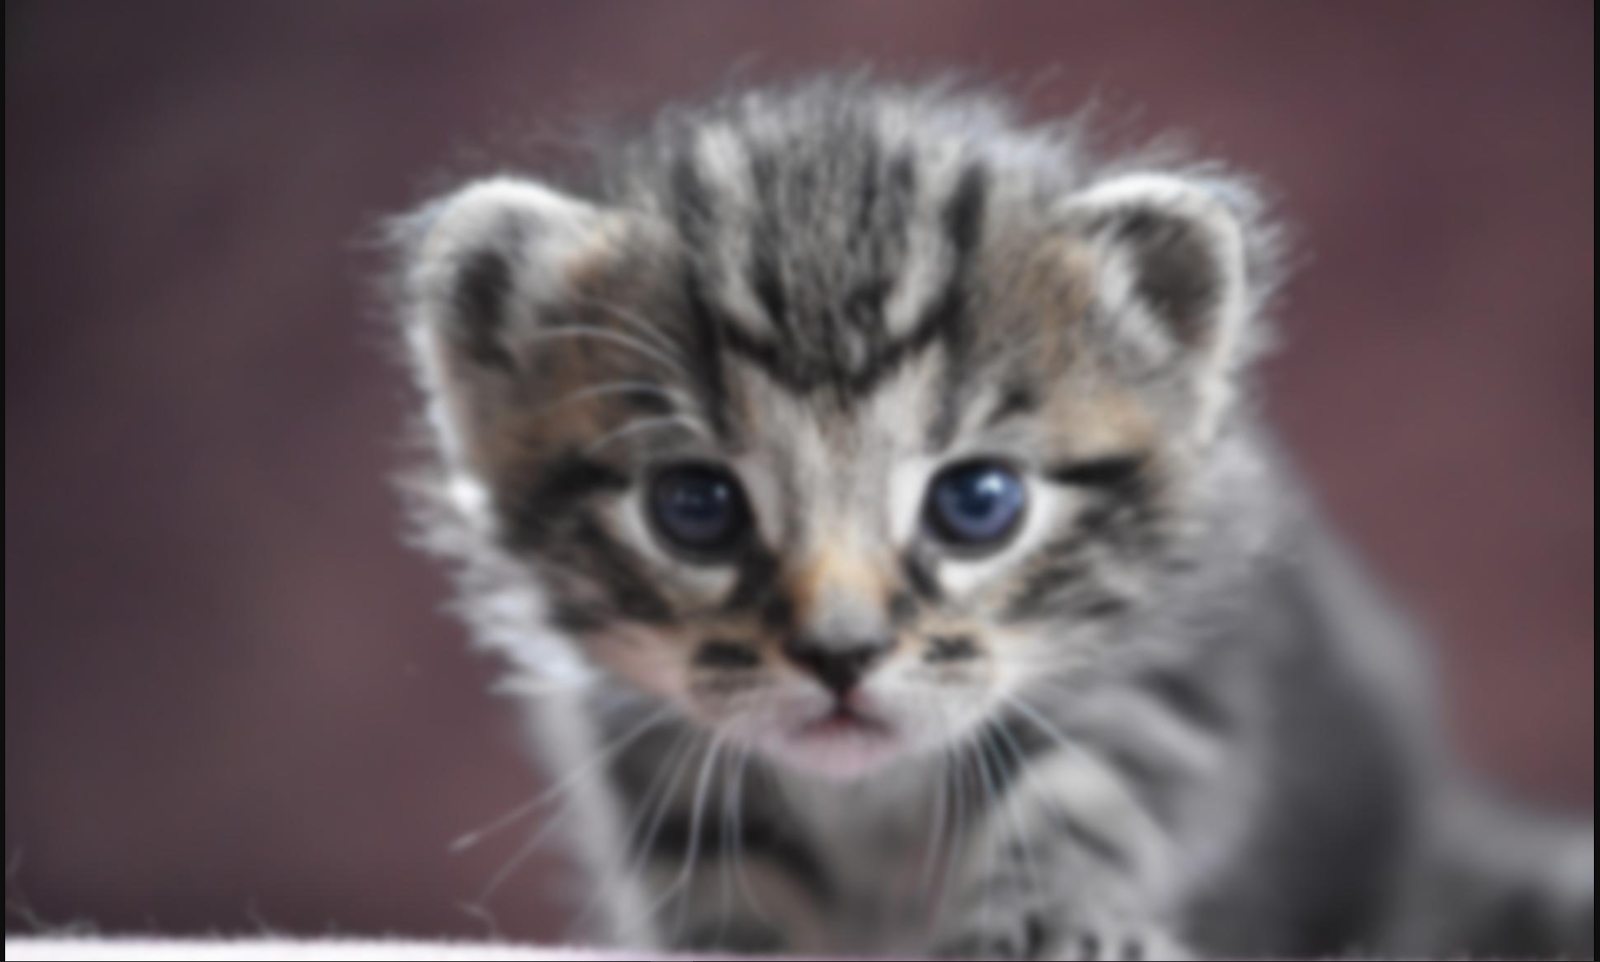 Slightly blurred version of the kitten photo